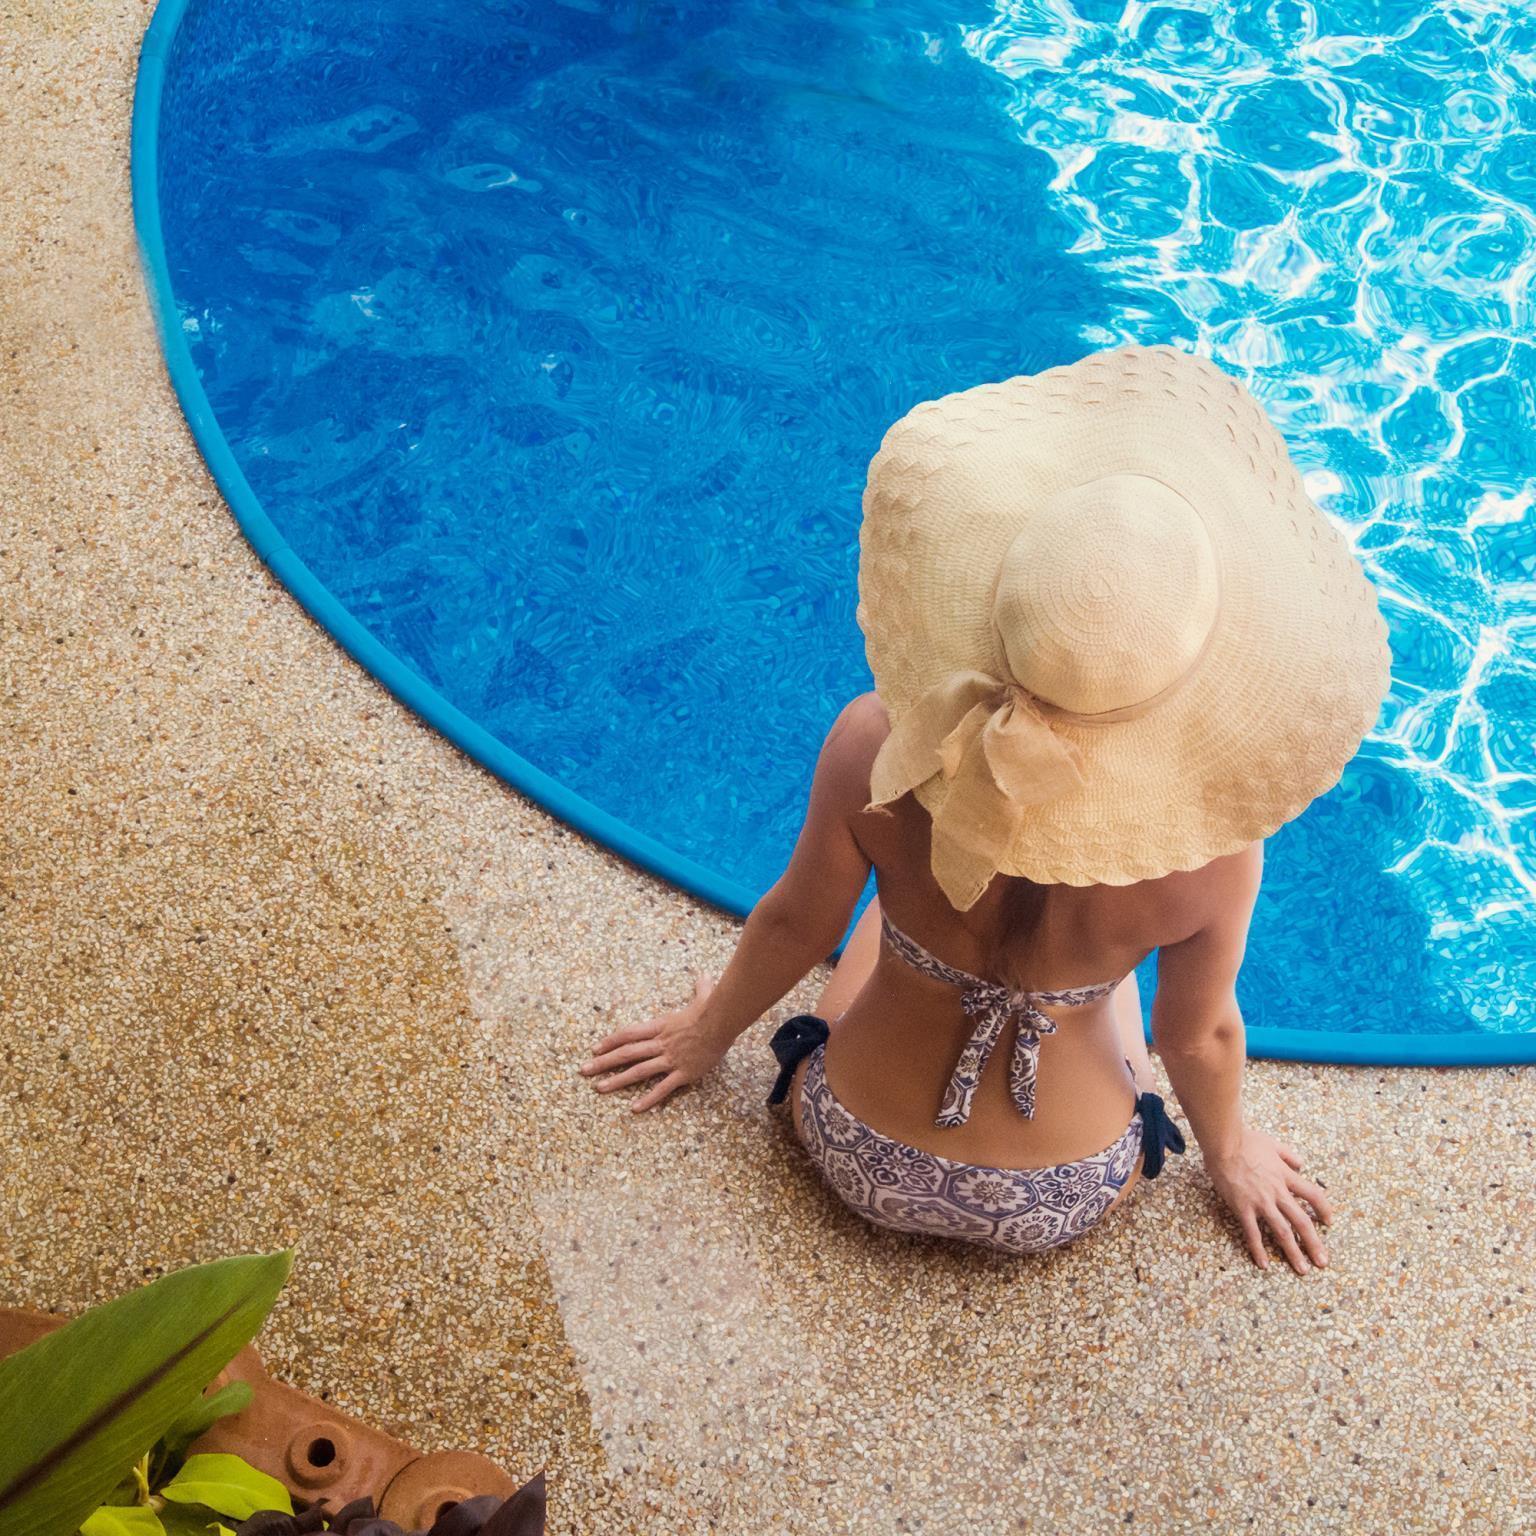 Villa SEAesta with private pool AO NANG วิลลา ซีเอสตา วิธ ไพรเวท พูล อ่าวนาง